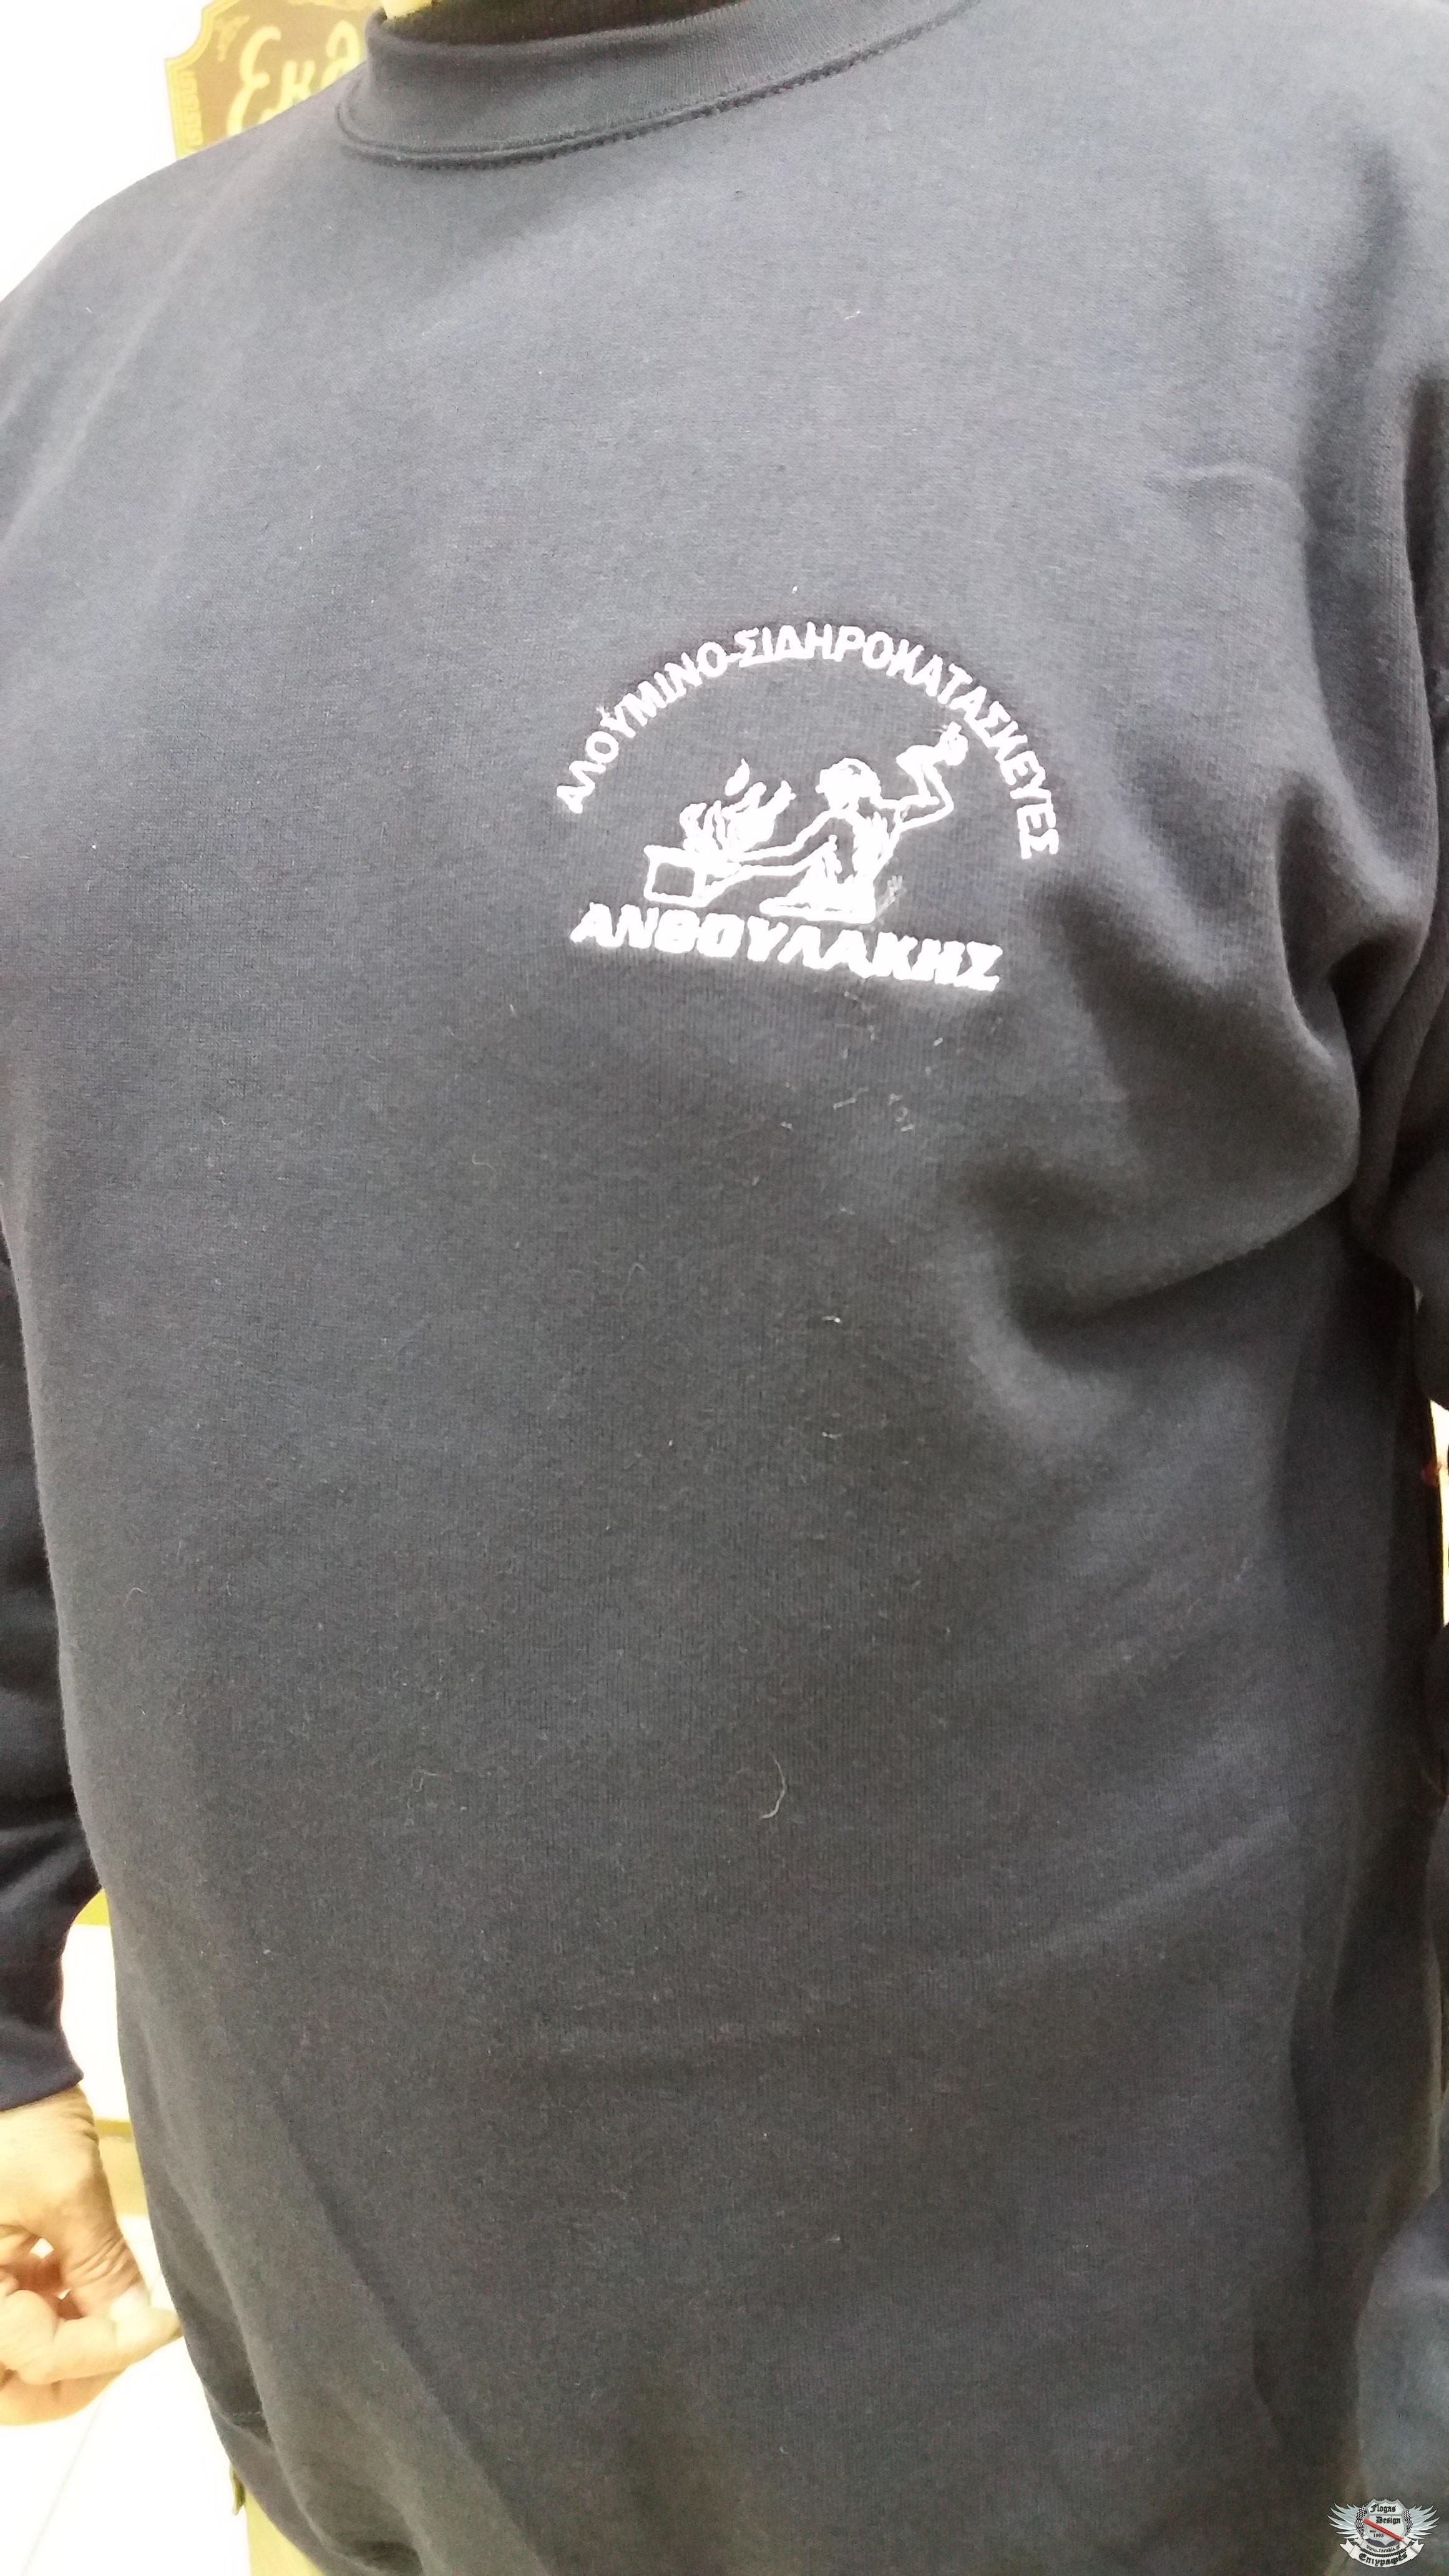 KENTHMENO ΛΟΓΟΤΥΠΟ ΚΕΝΤΗΜΕΝΟ,ΚΕΝΤΗΜΑ,ΔΙΑΦΗΜΙΣΤΙΚΟ,ραμμένο λογότυπο